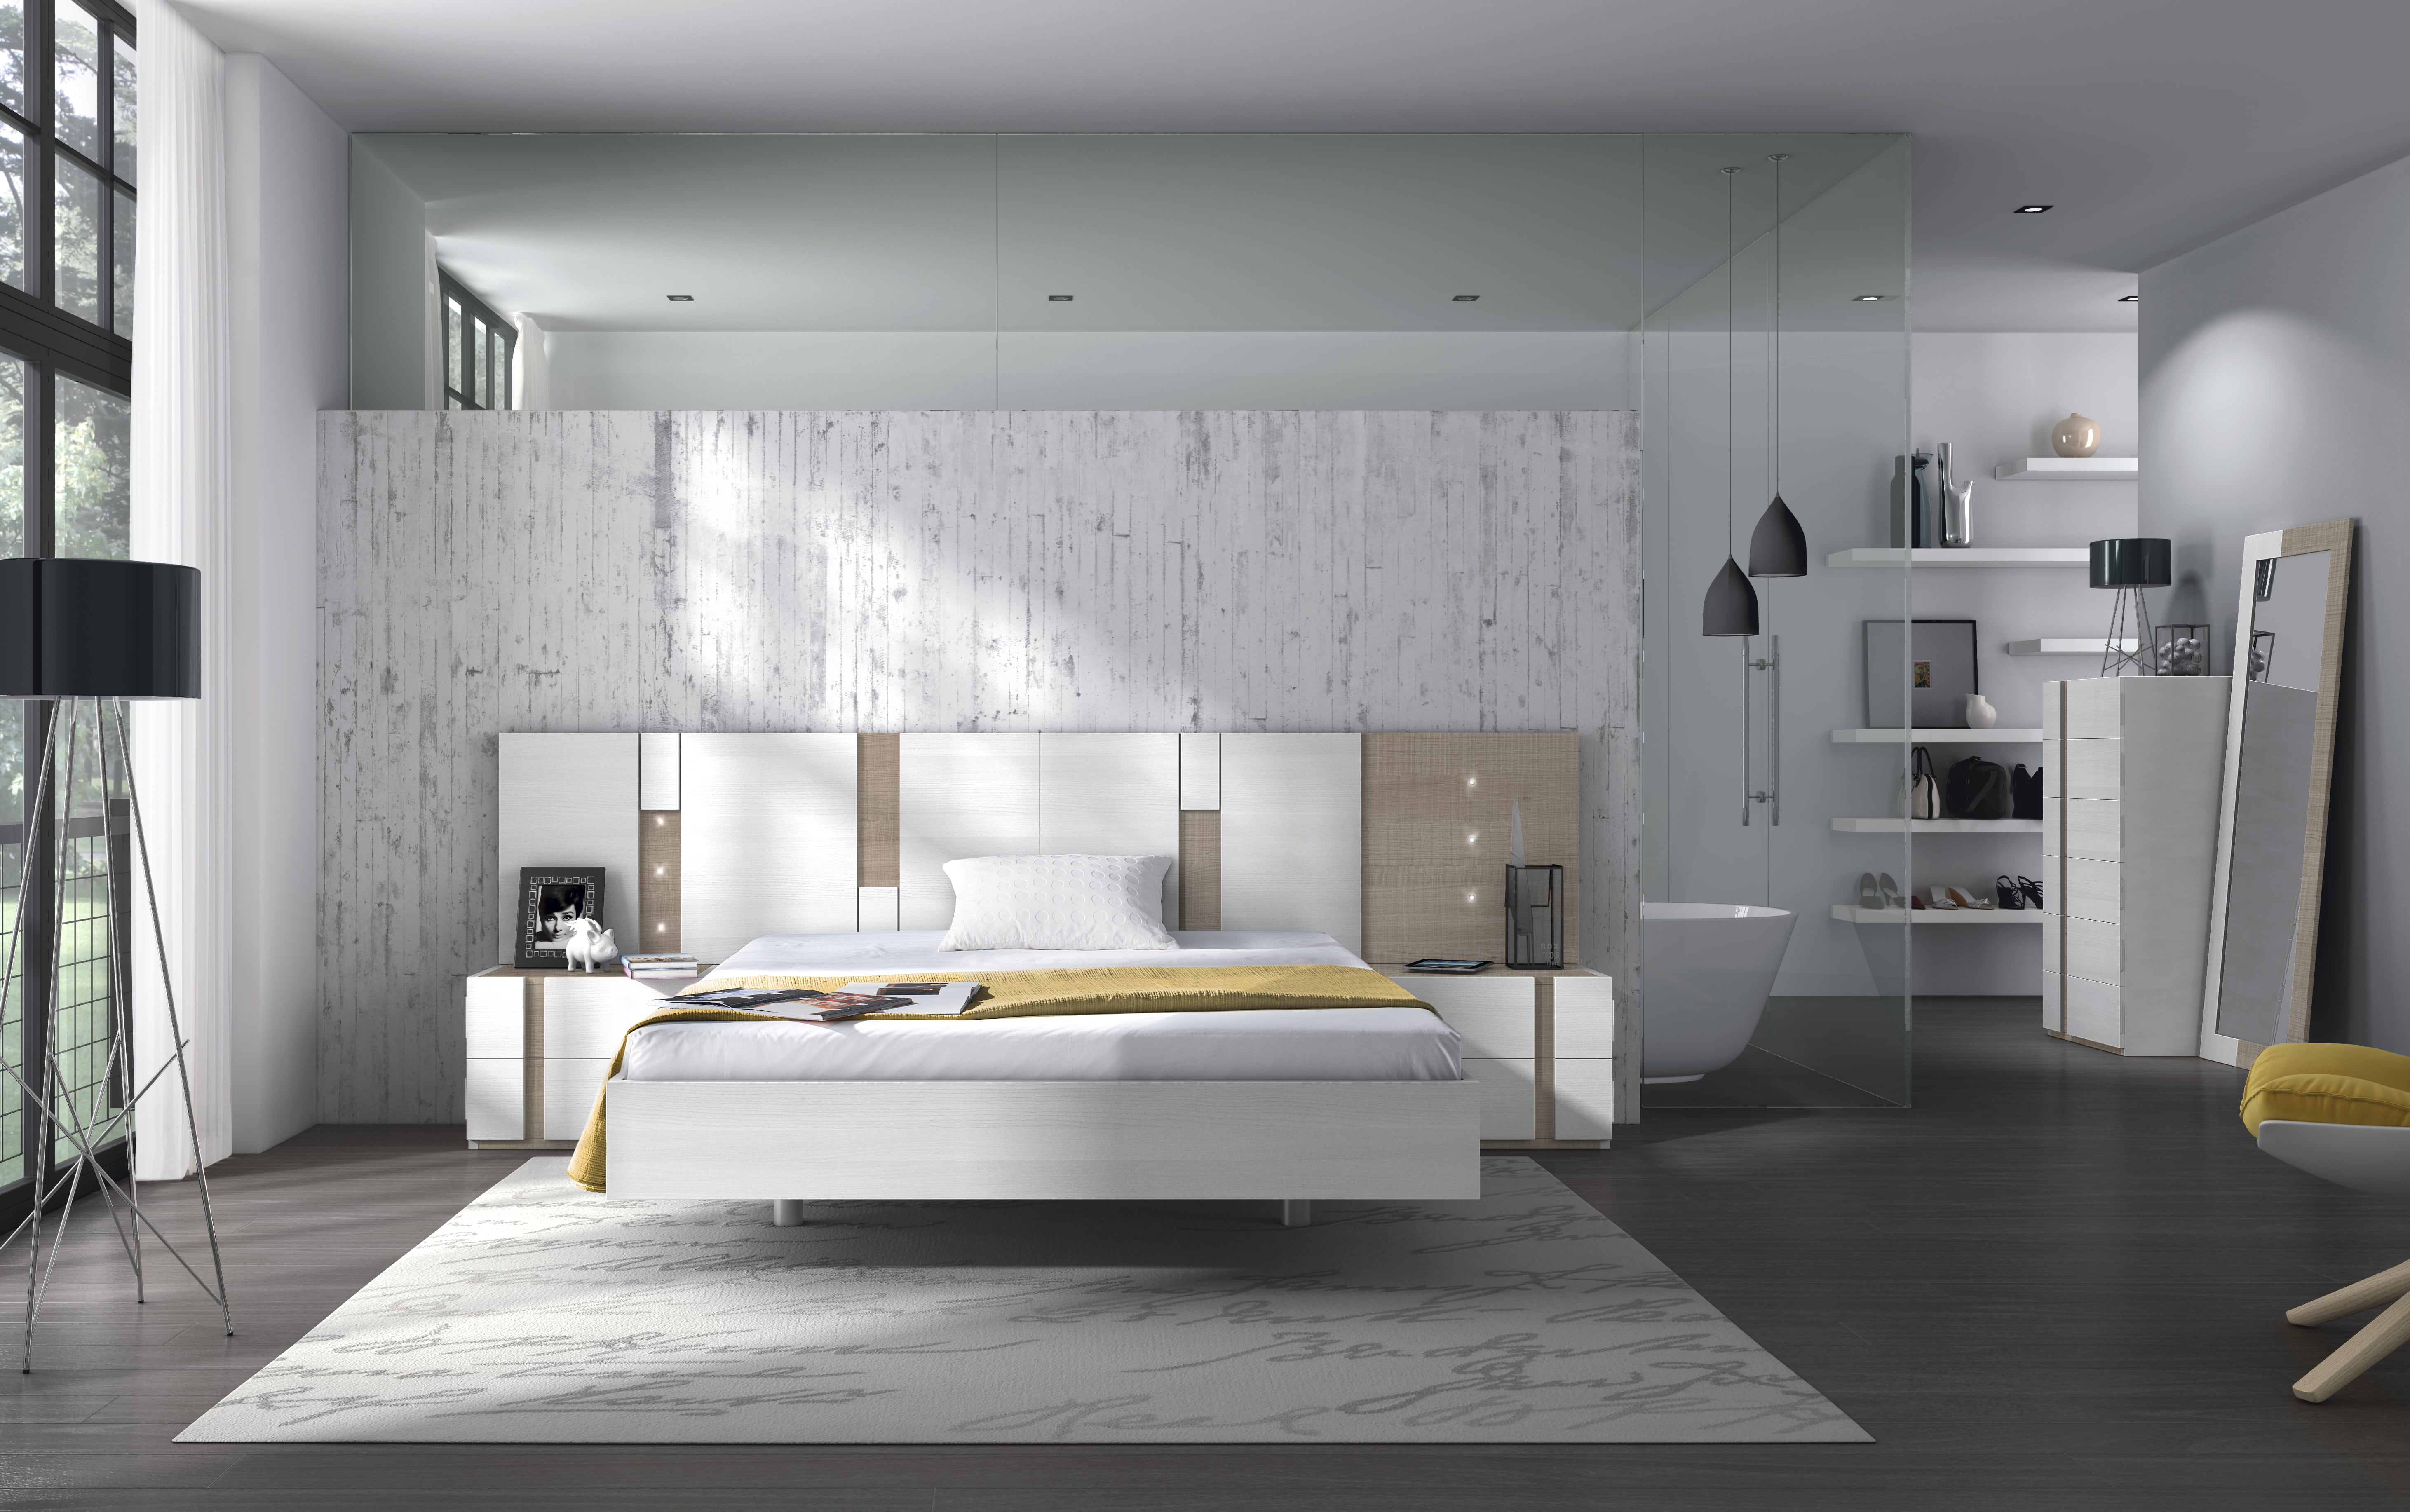 Dormitorio matrimonio con diferentes variantes tanto de acabados como de diseños.